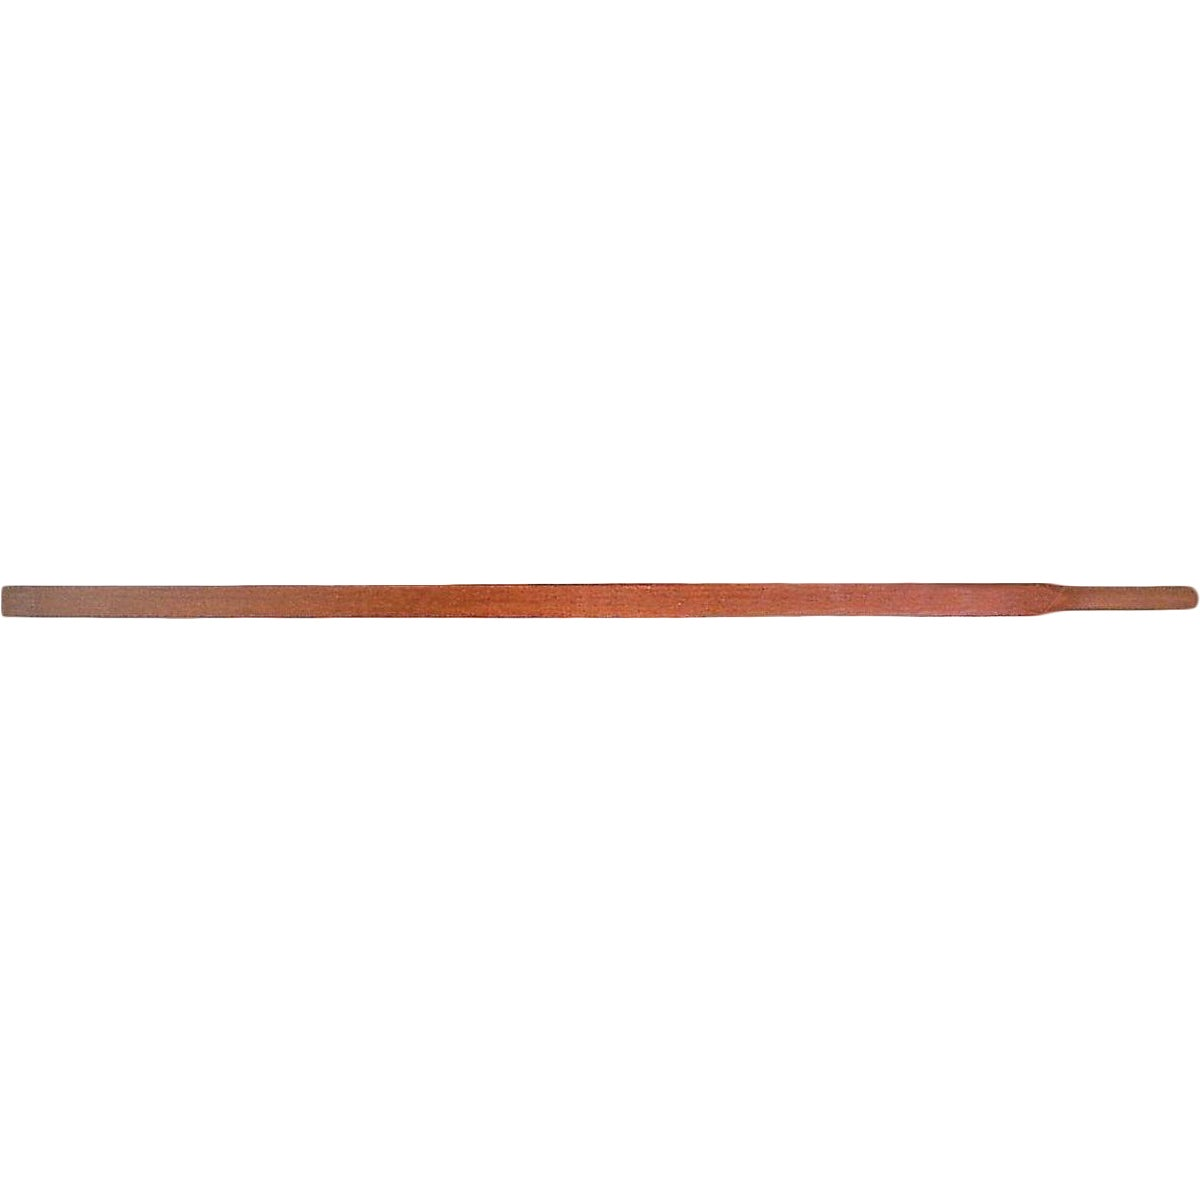 Link Handle WHEELBARROW HANDLE 35-025-48